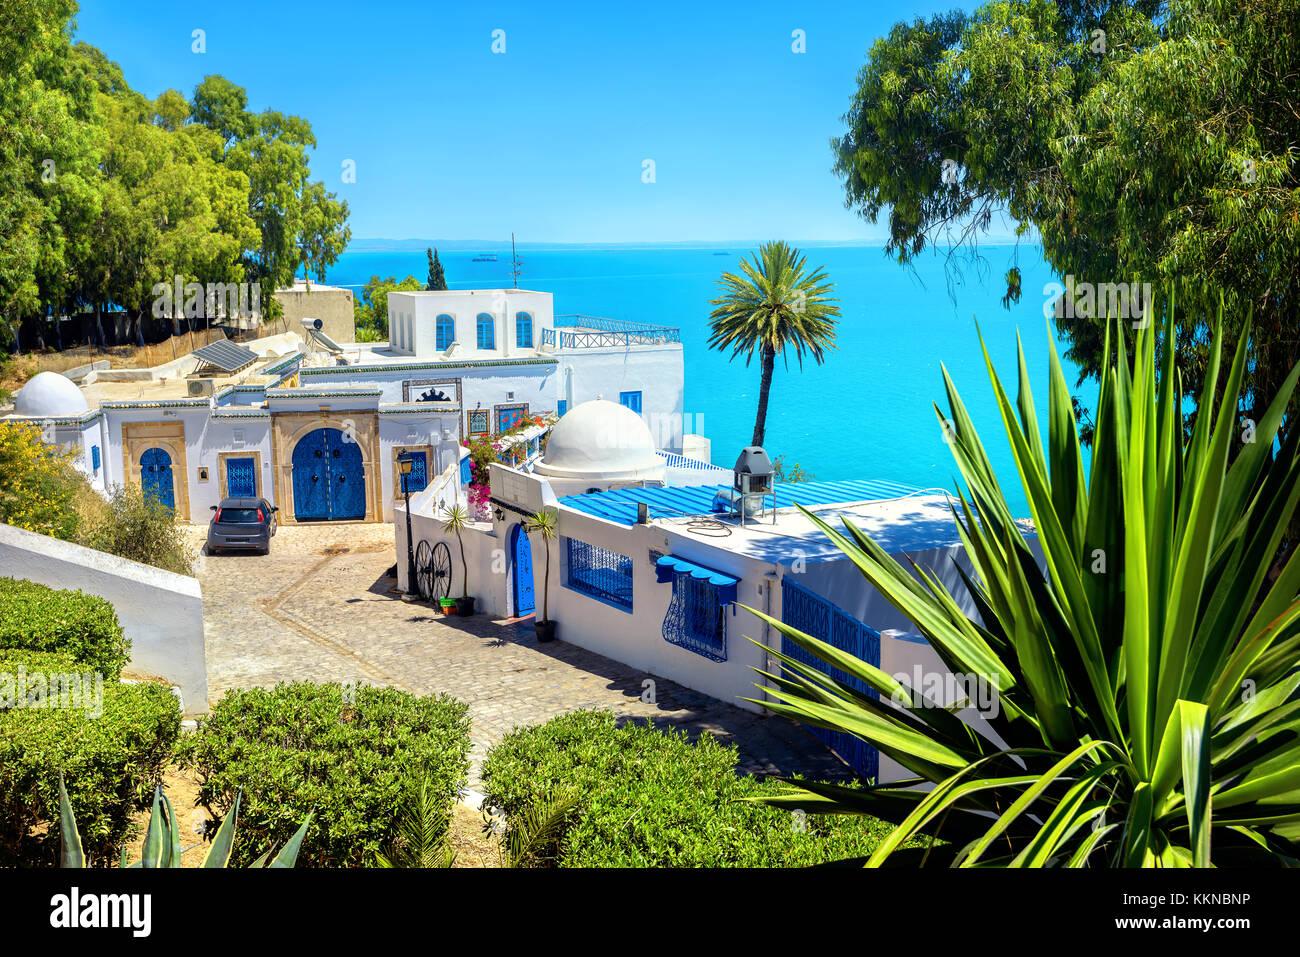 Vista de la ciudad balnearia de Sidi Bou Said. Túnez, norte de África Imagen De Stock